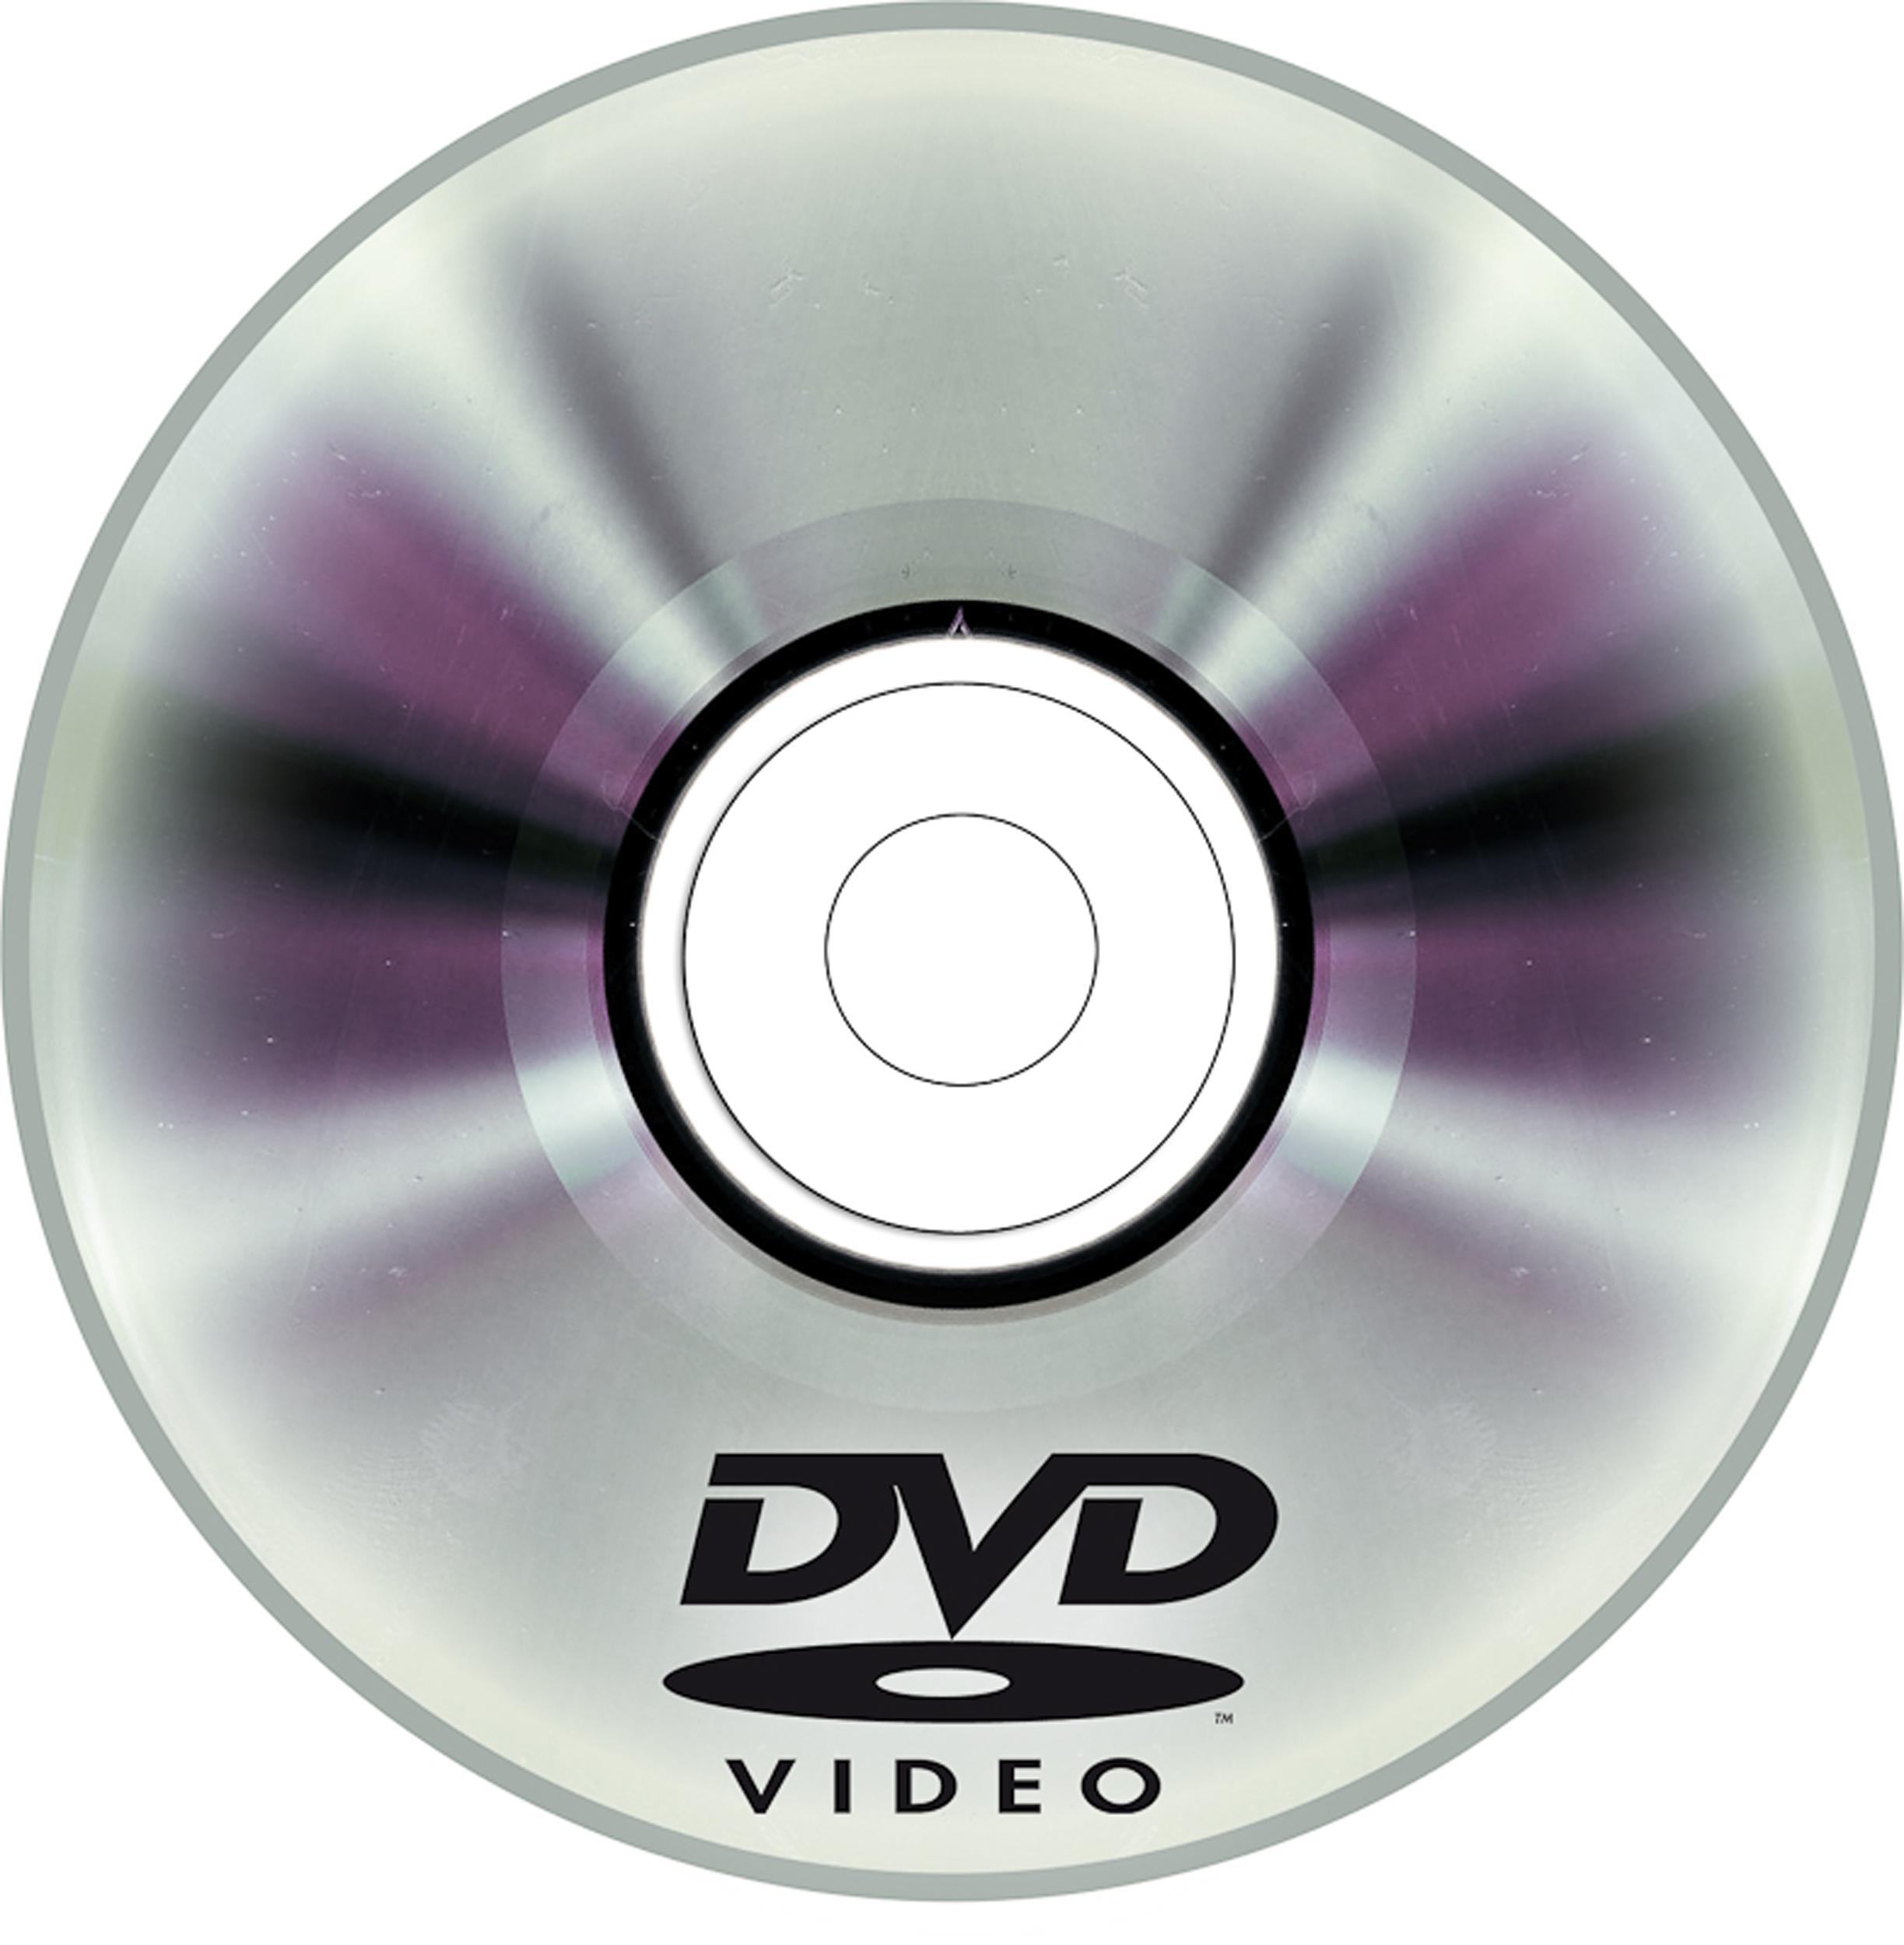 dvd-image-1509615325.jpg